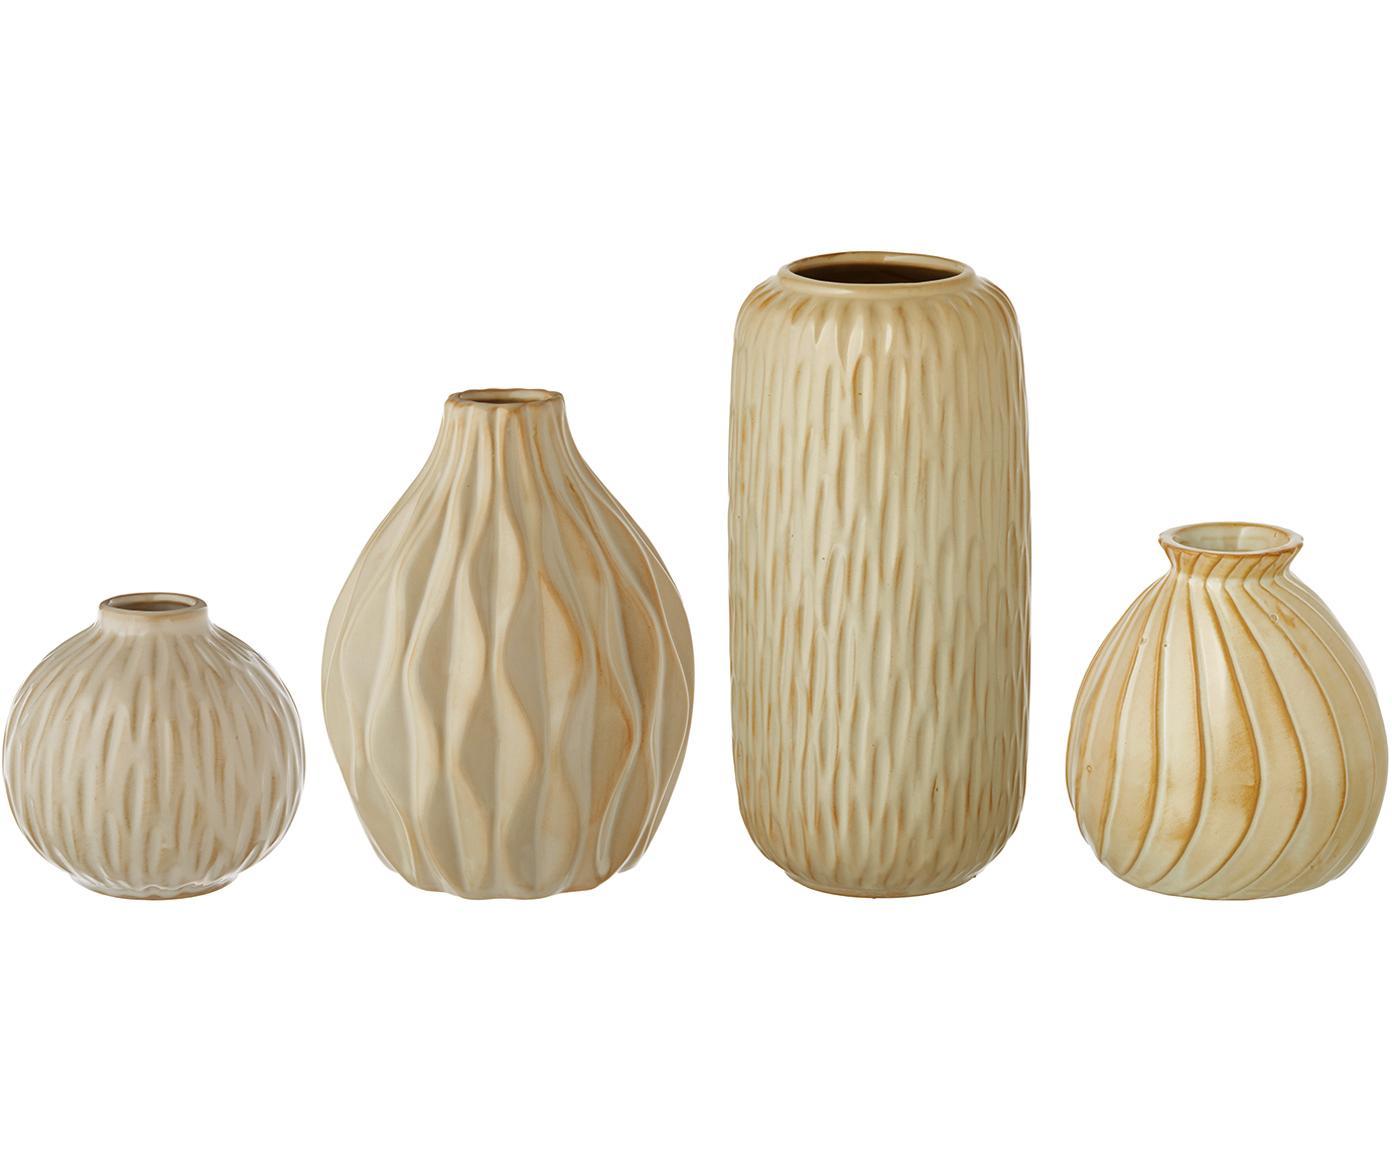 Set de jarrones de porcelana Zalina, 4pzas., Porcelana, Crema, beige, Tamaños diferentes